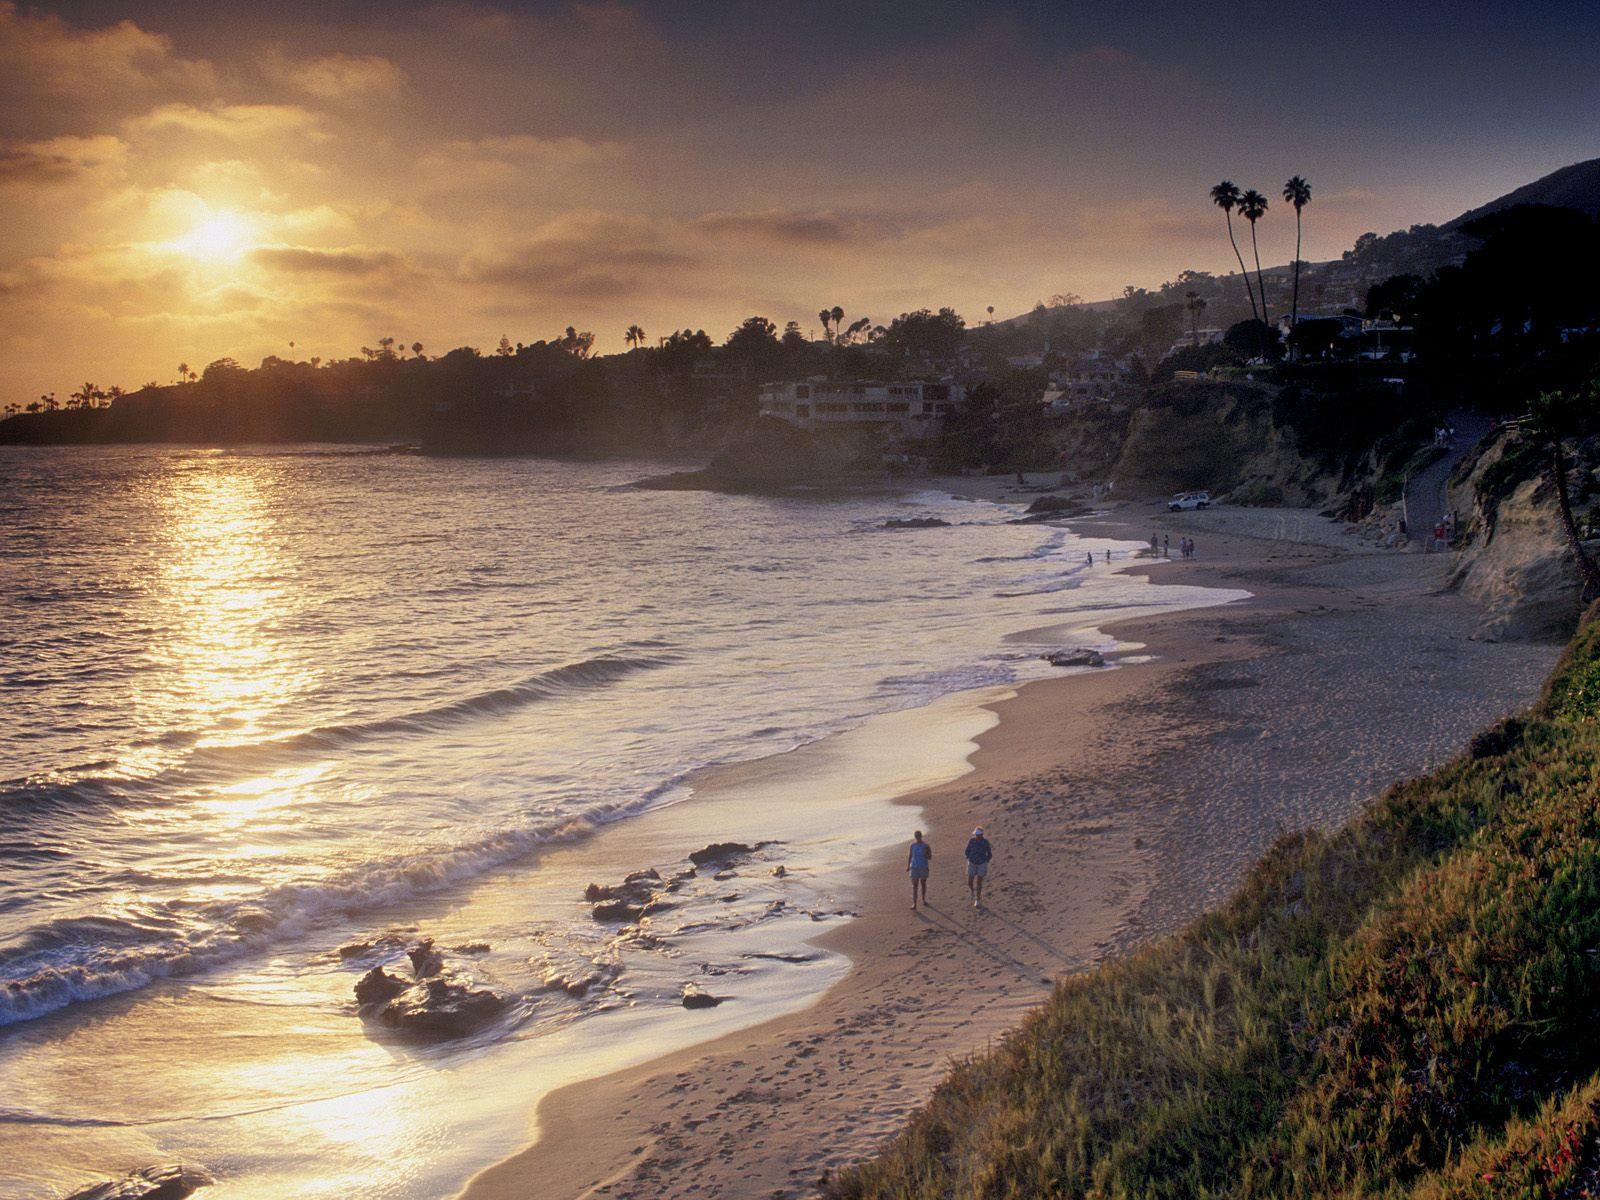 Laguna Beach Wallpapers Download Desktop Wallpaper Images 1600x1200